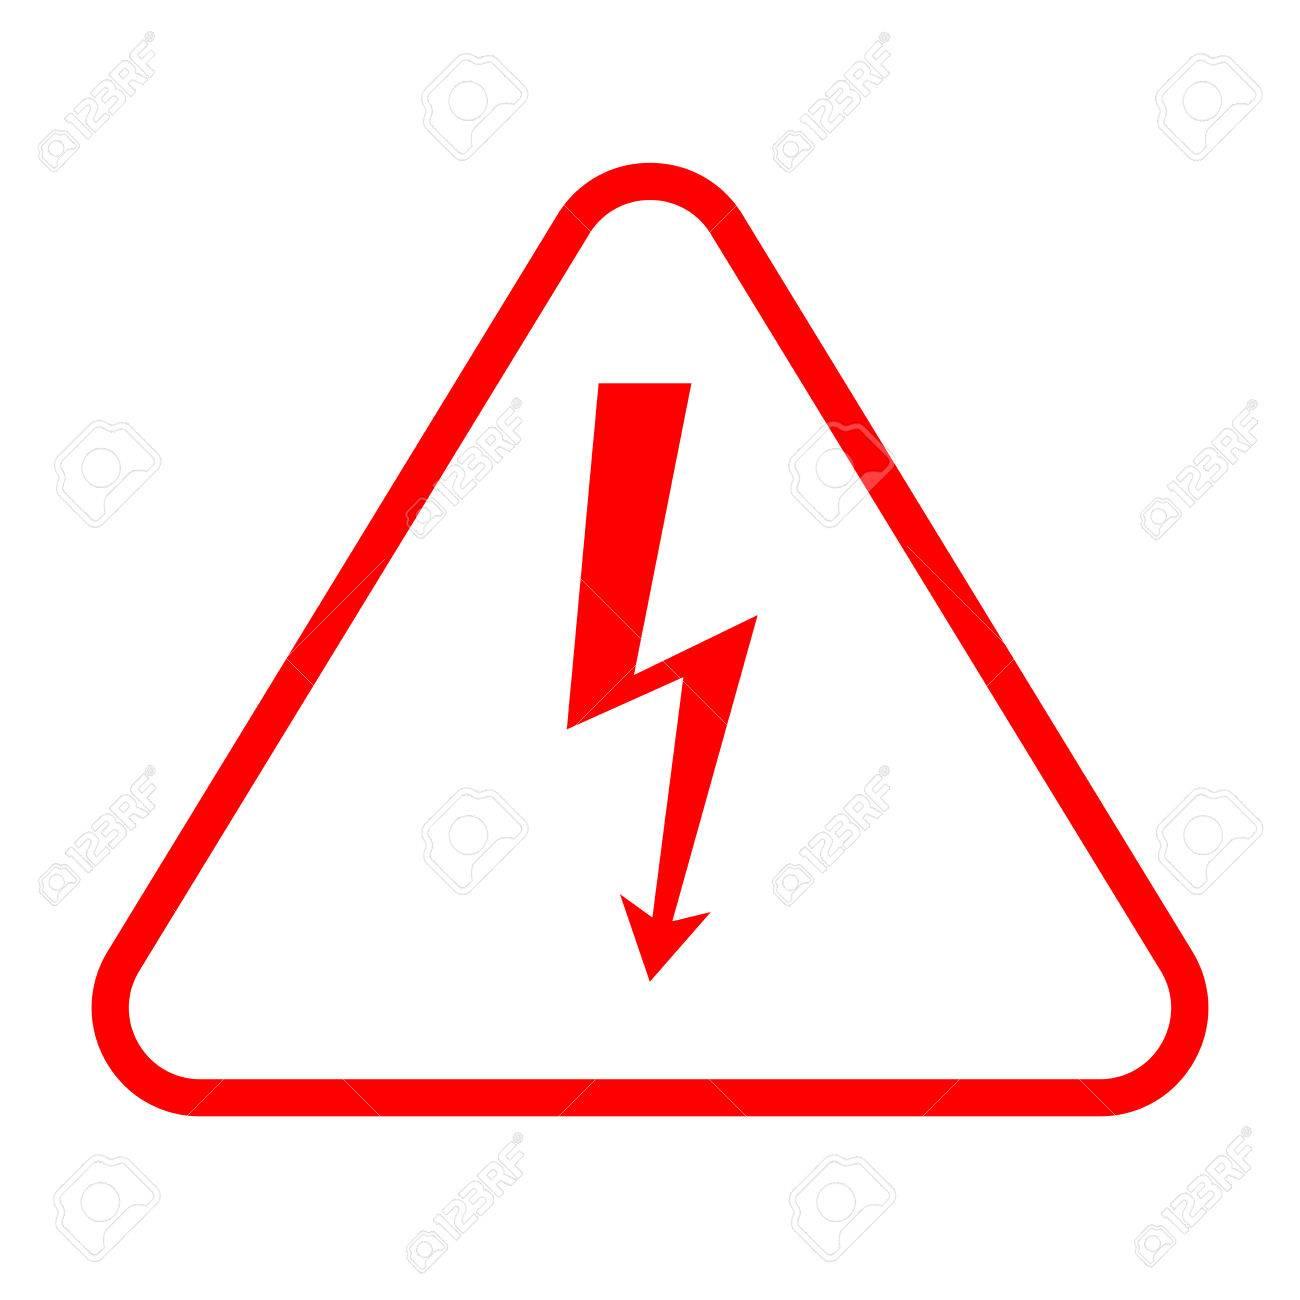 Danger sign with frame vector illustration of high voltage symbol danger sign with frame vector illustration of high voltage symbol stock vector 57402214 buycottarizona